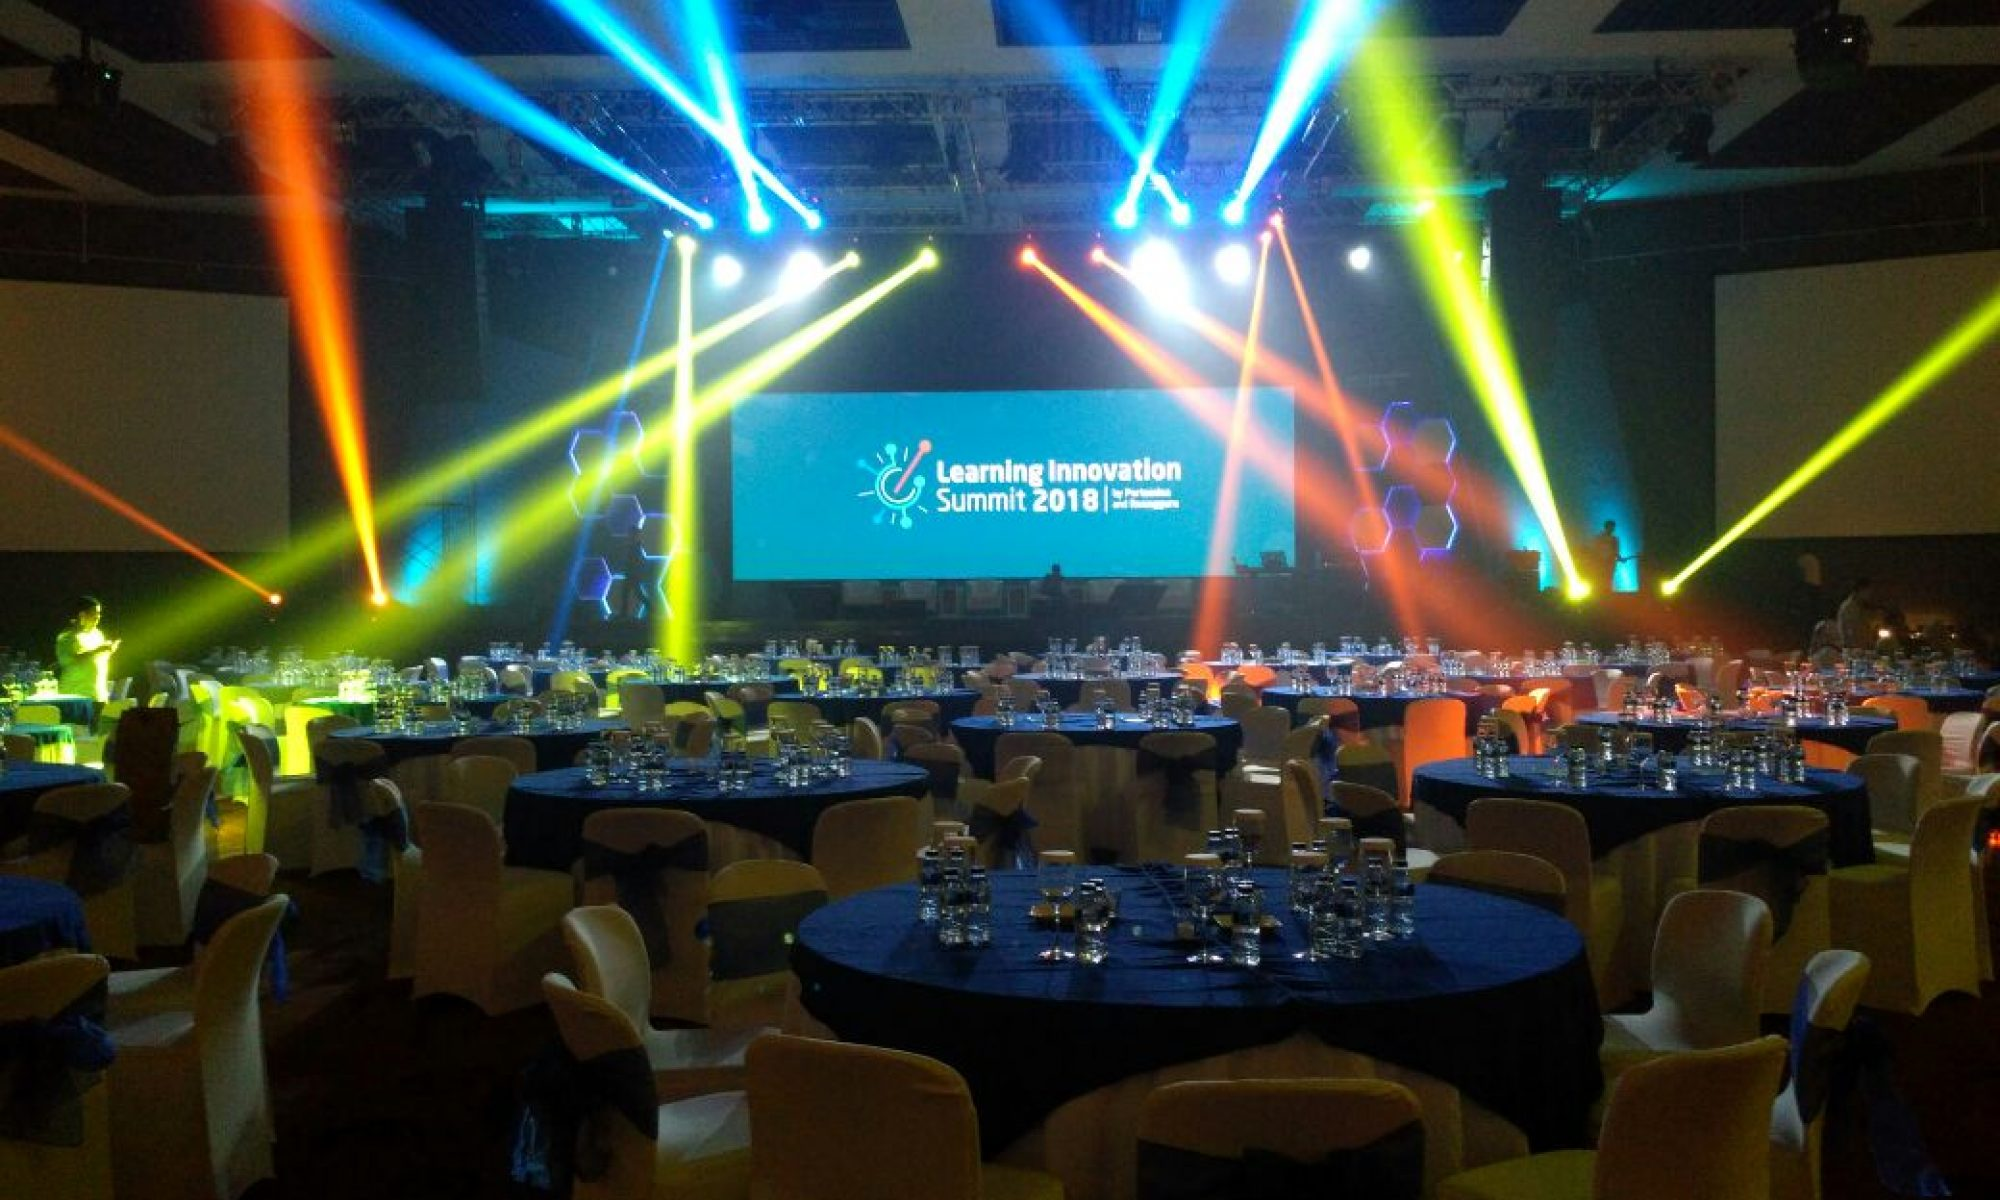 Sewa Alat Pesta Murah Berkualitas Di Bekasi Surya Jaya Party